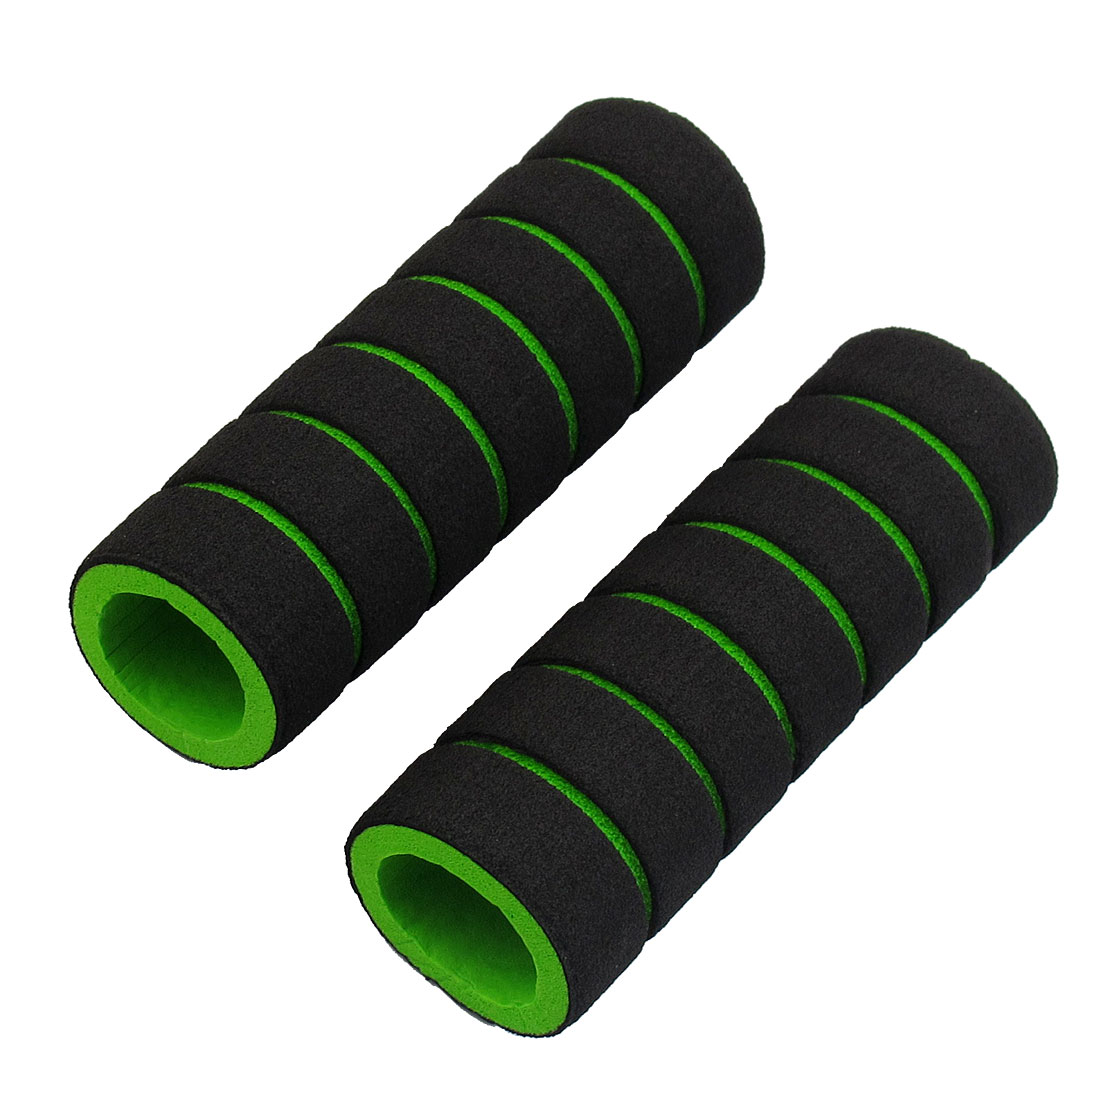 2 Pcs Striped Nonslip Cycling Bike Handlebar Grip Cover Black Green